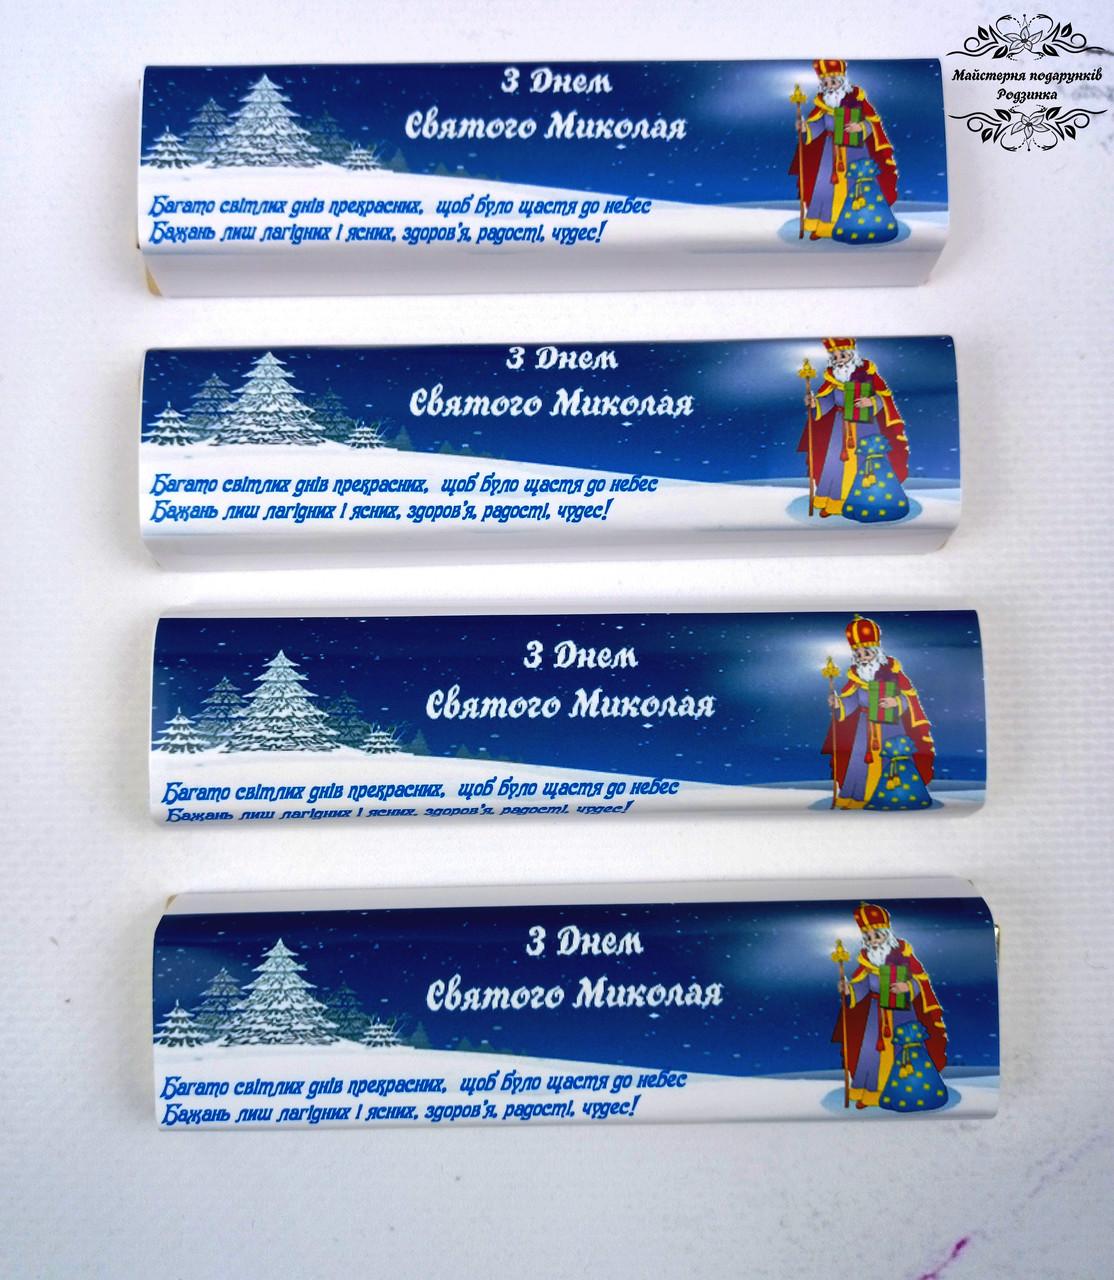 "Шоколадний батончик "" З Днем Святого Миколая"" 40грам. Подарунок на Миколая."